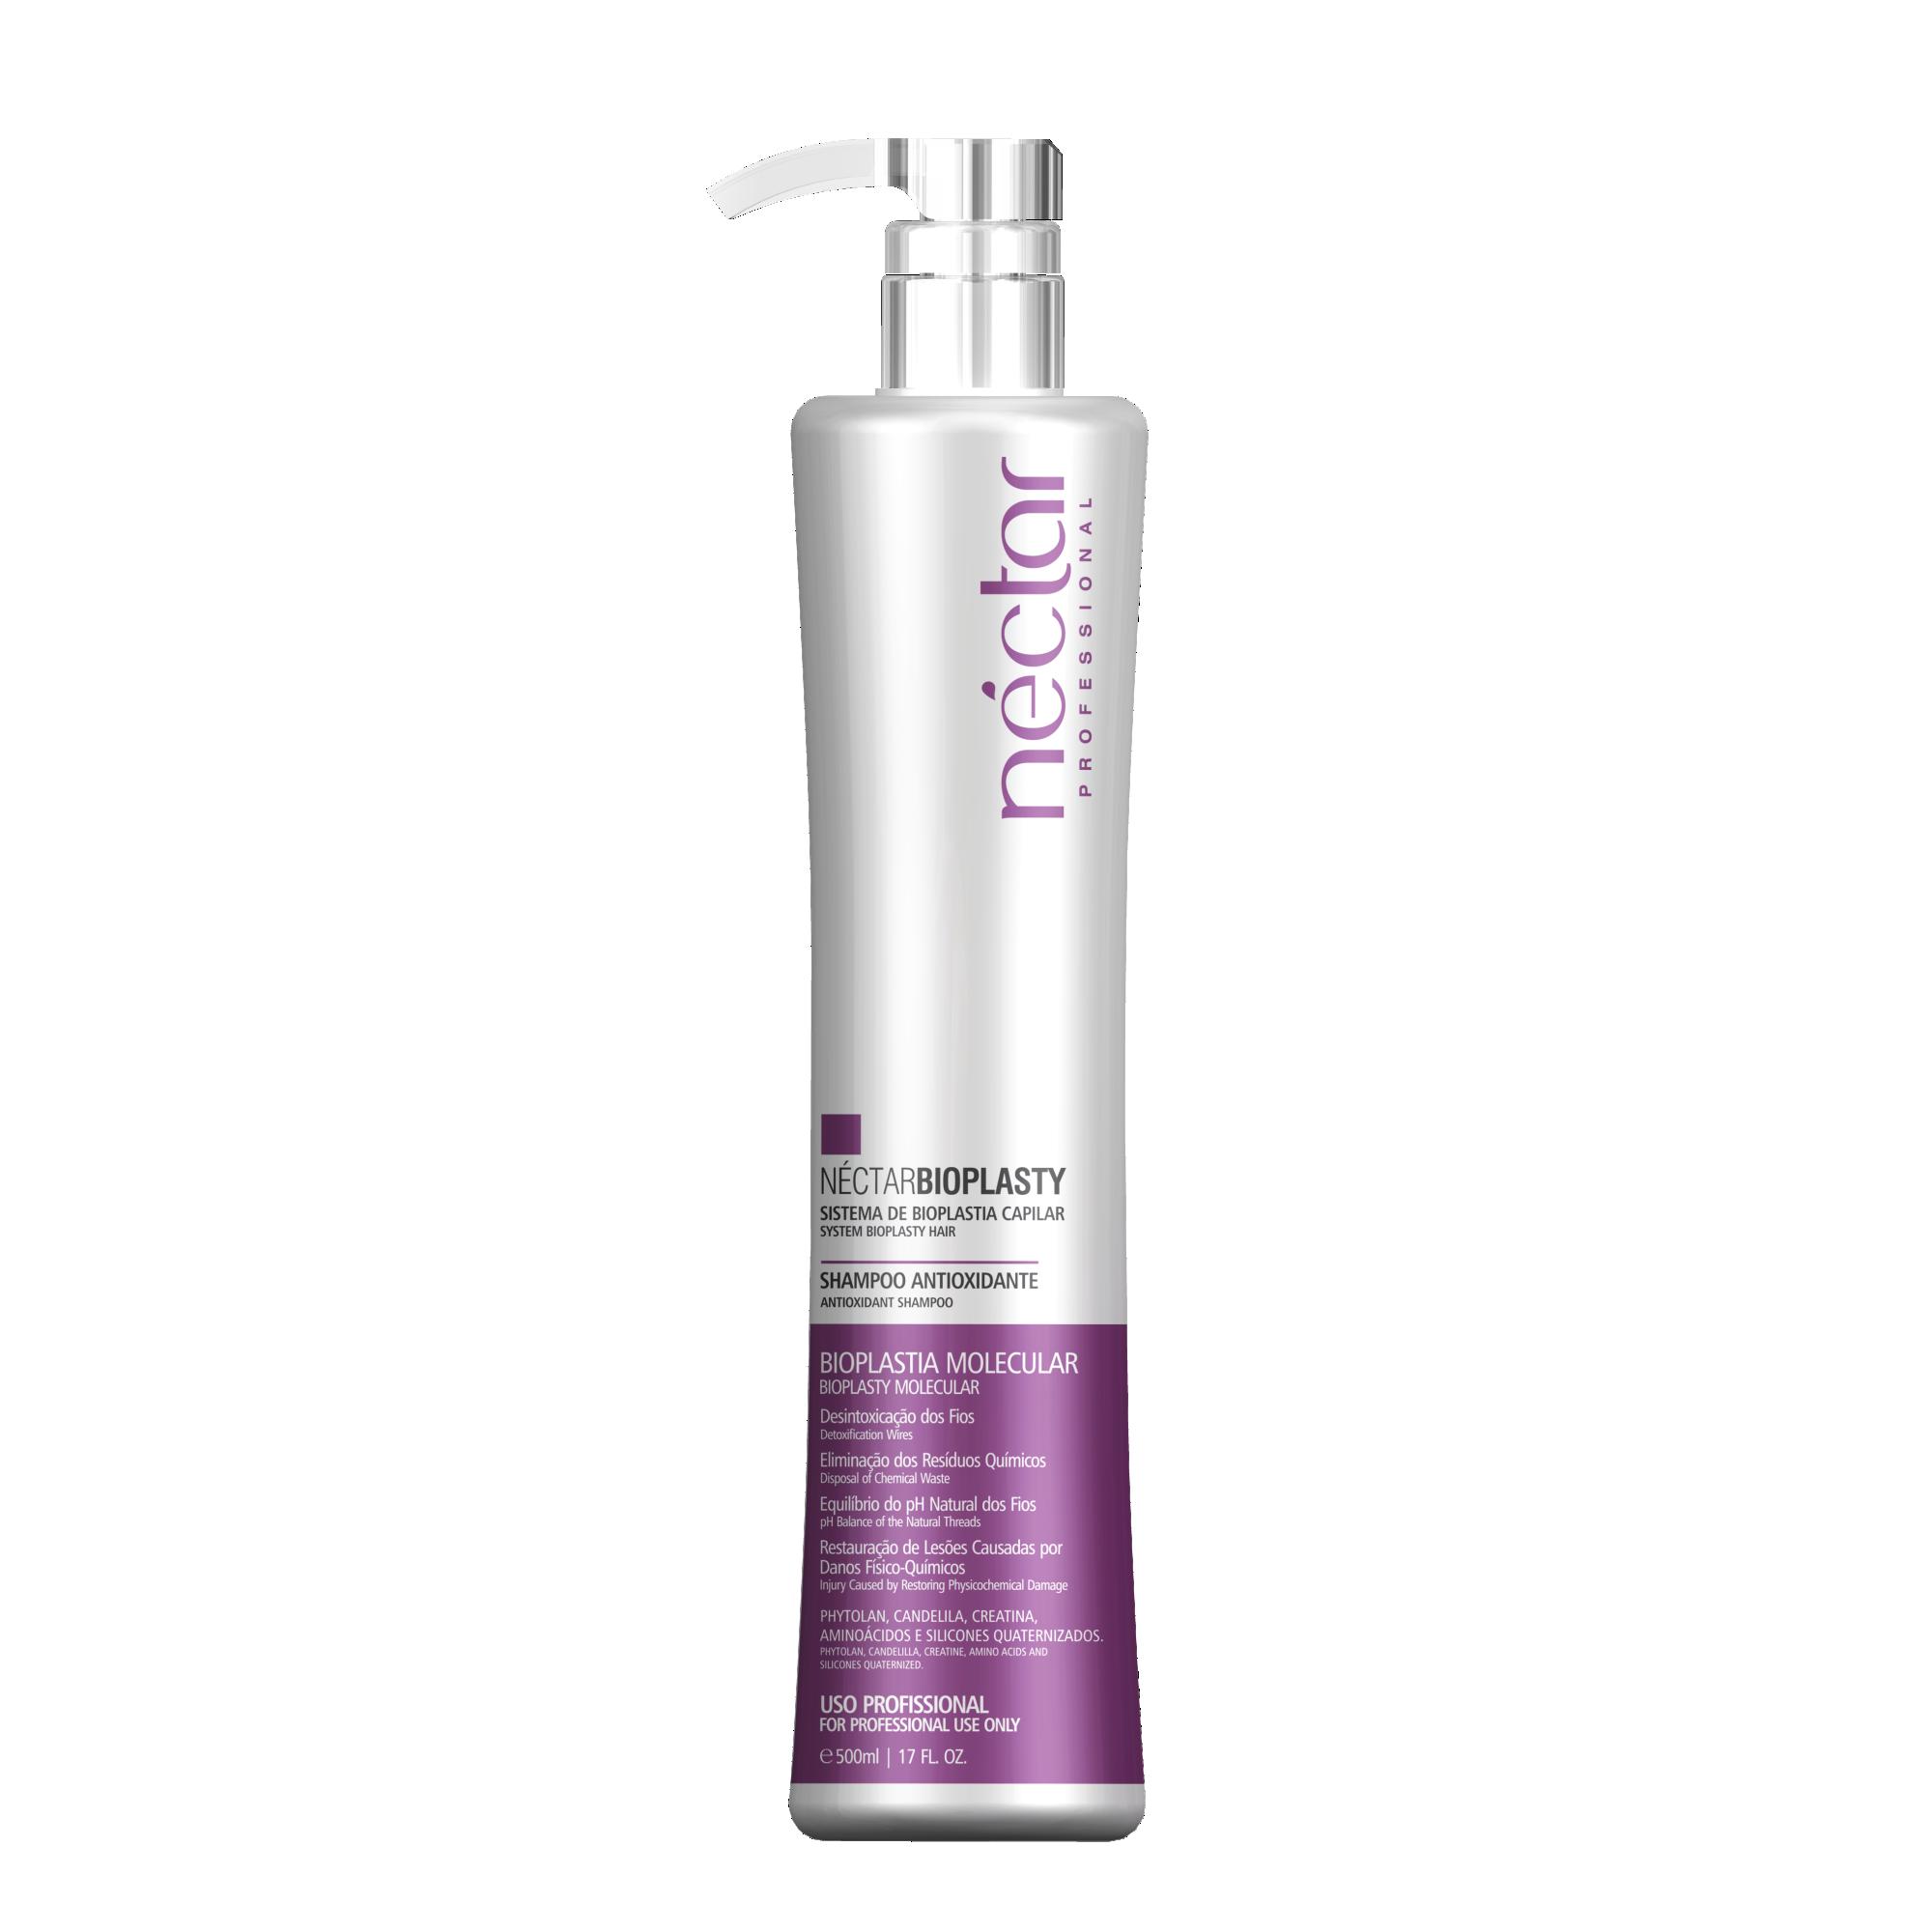 Shampoo Antioxidante Plastia 500ml - Professional